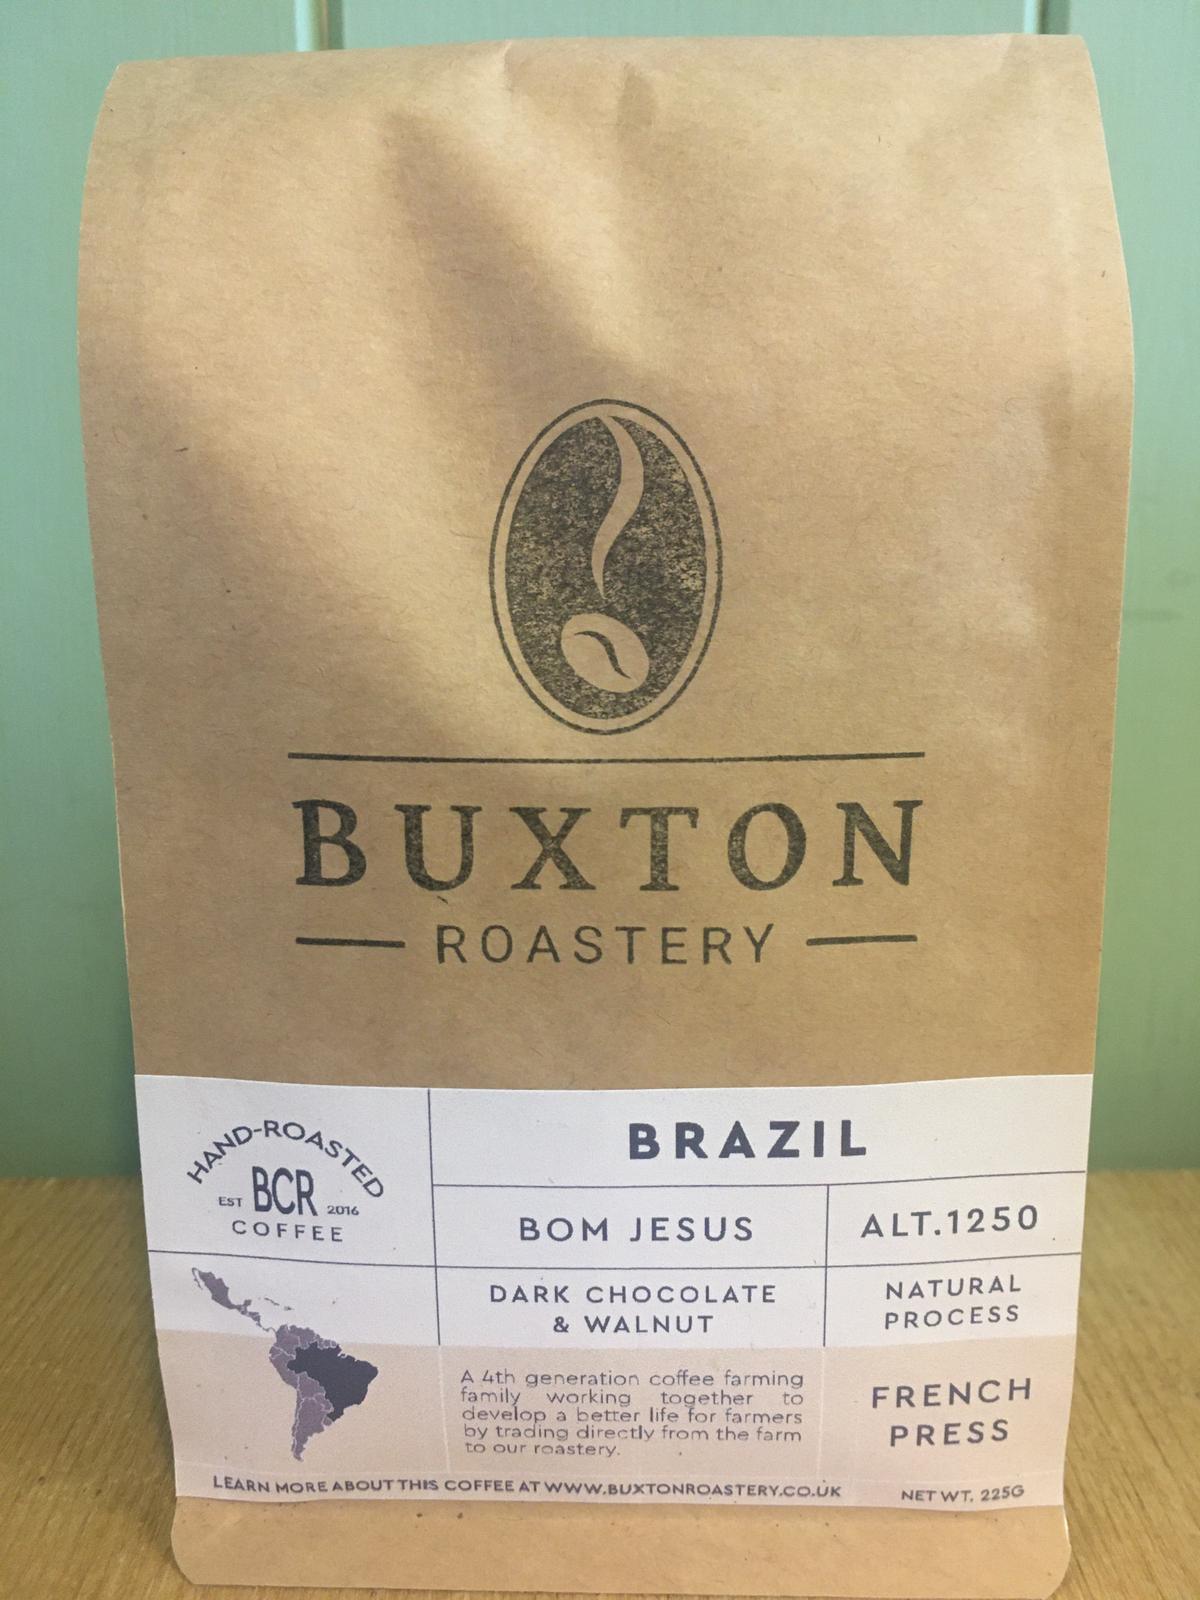 Buxton Roastery Coffee - Brazil Bom Jesus 225g